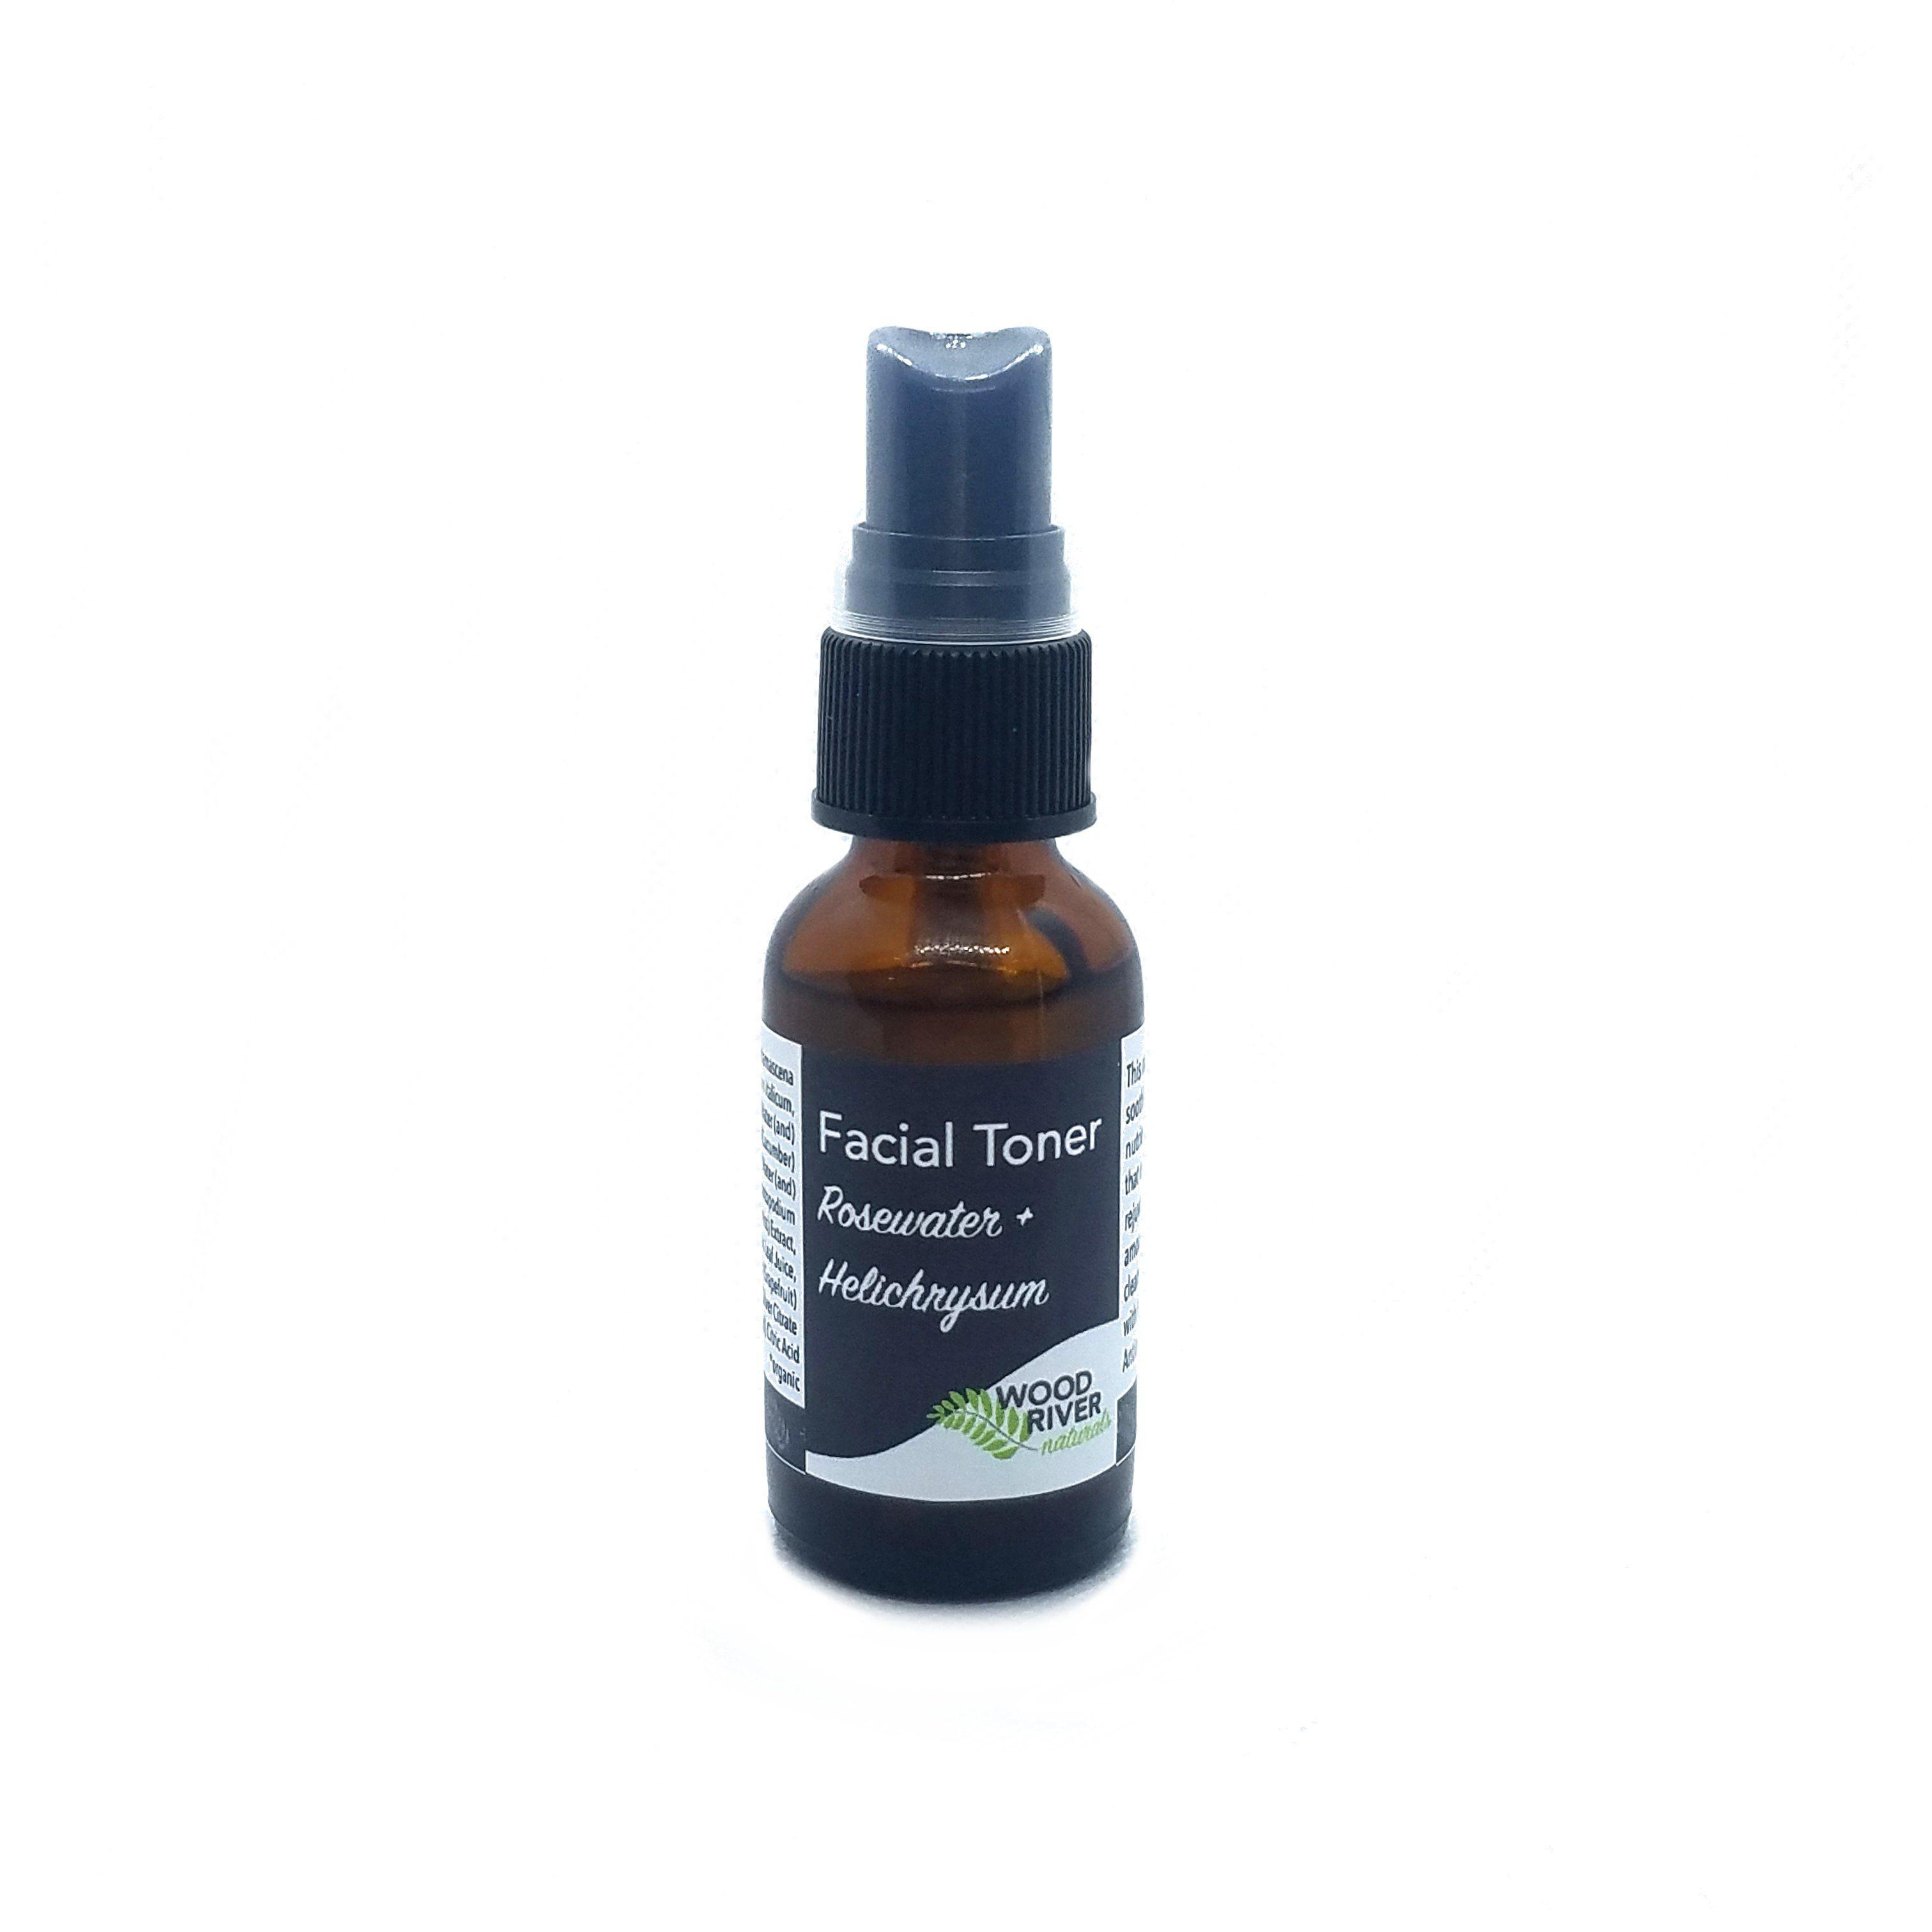 Facial Toner Facial toner, Skin care toner products